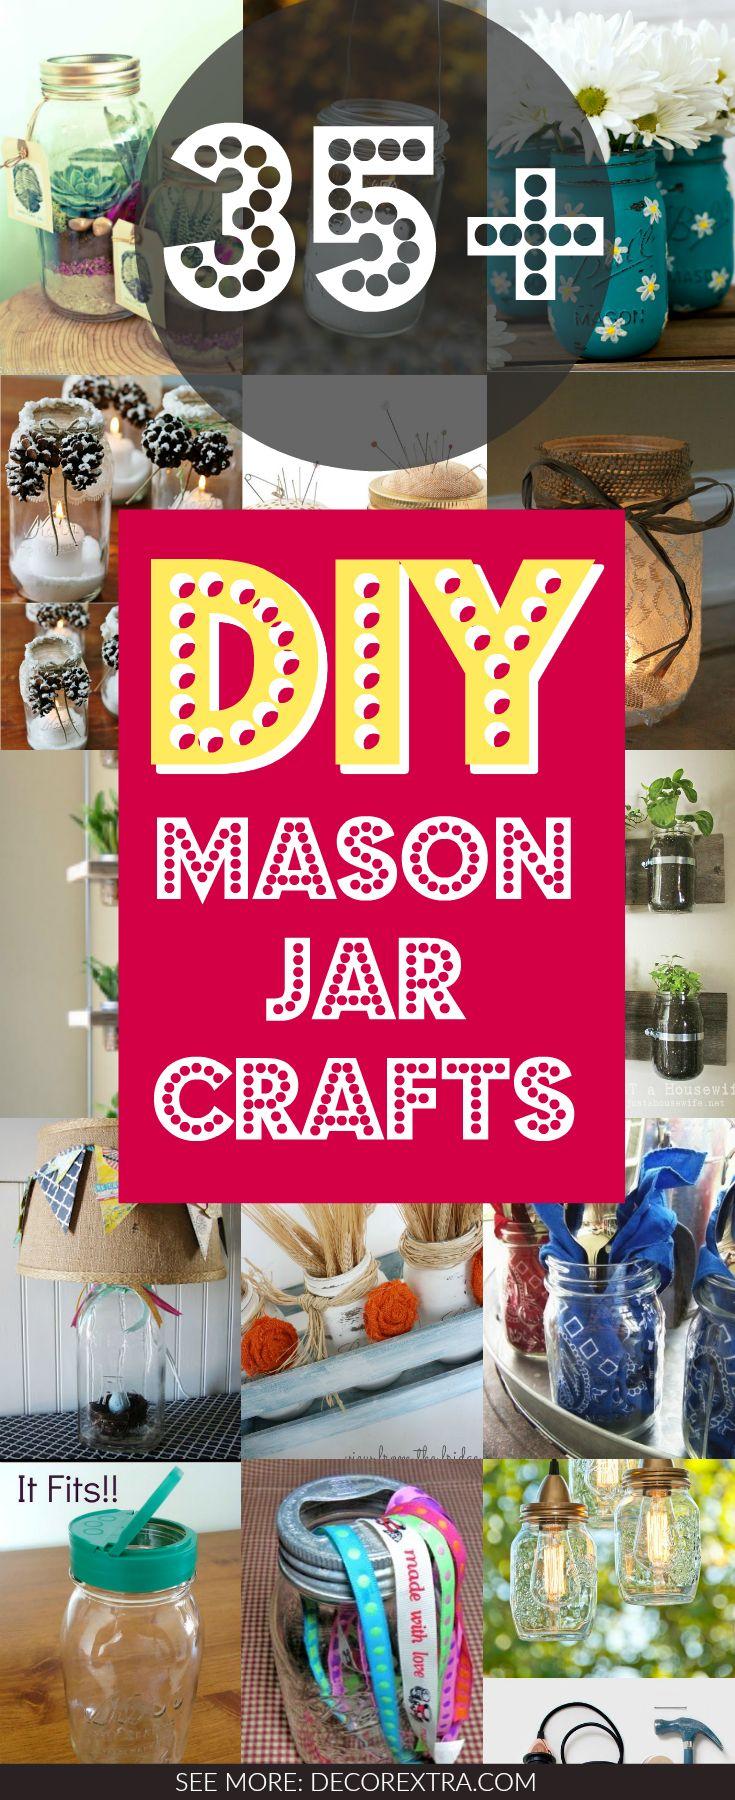 35+ Amazing DIY Mason Jar Projects You Must See via @decorextra